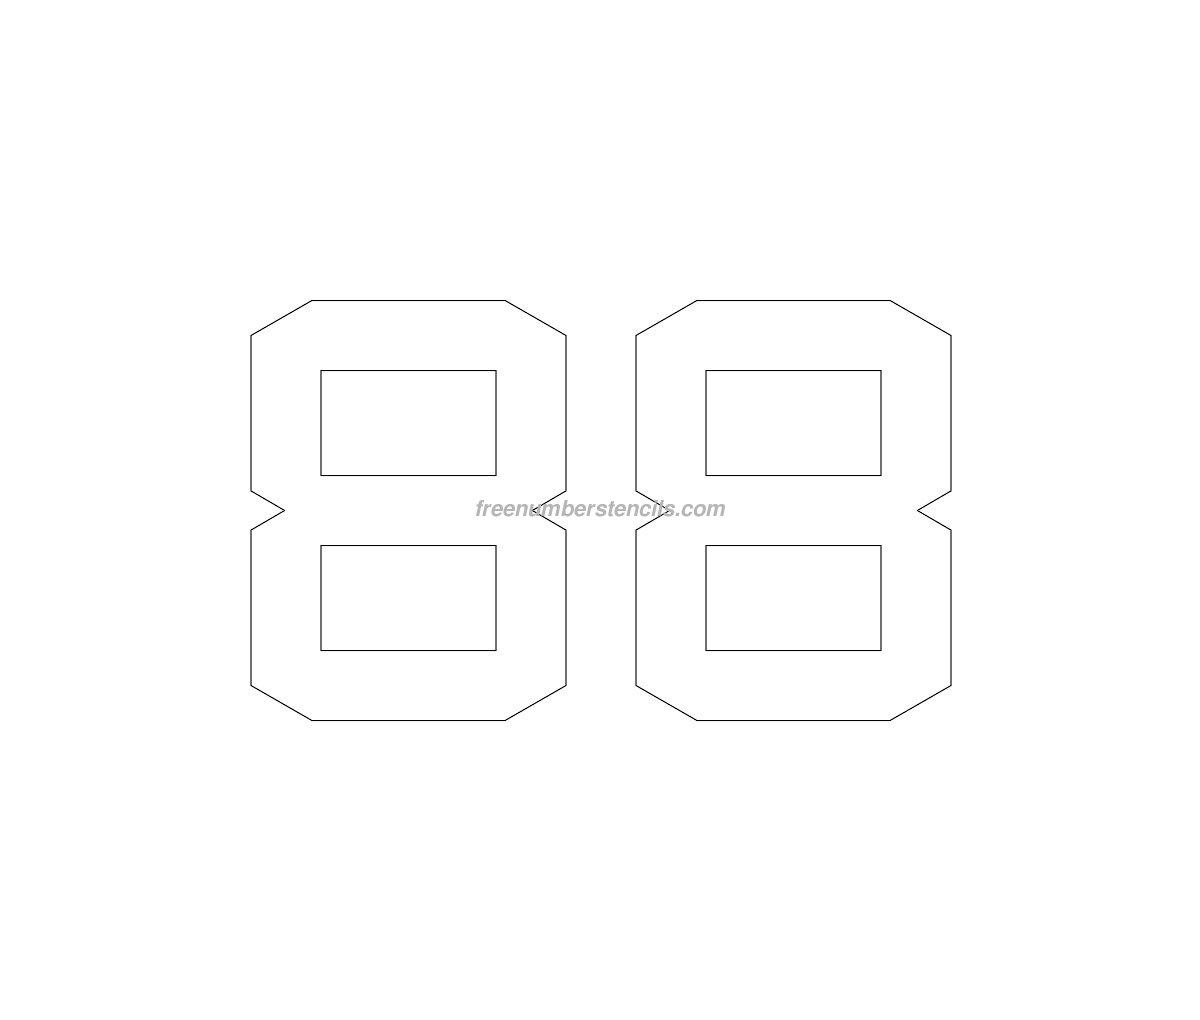 stencil-parking-lot-number-88